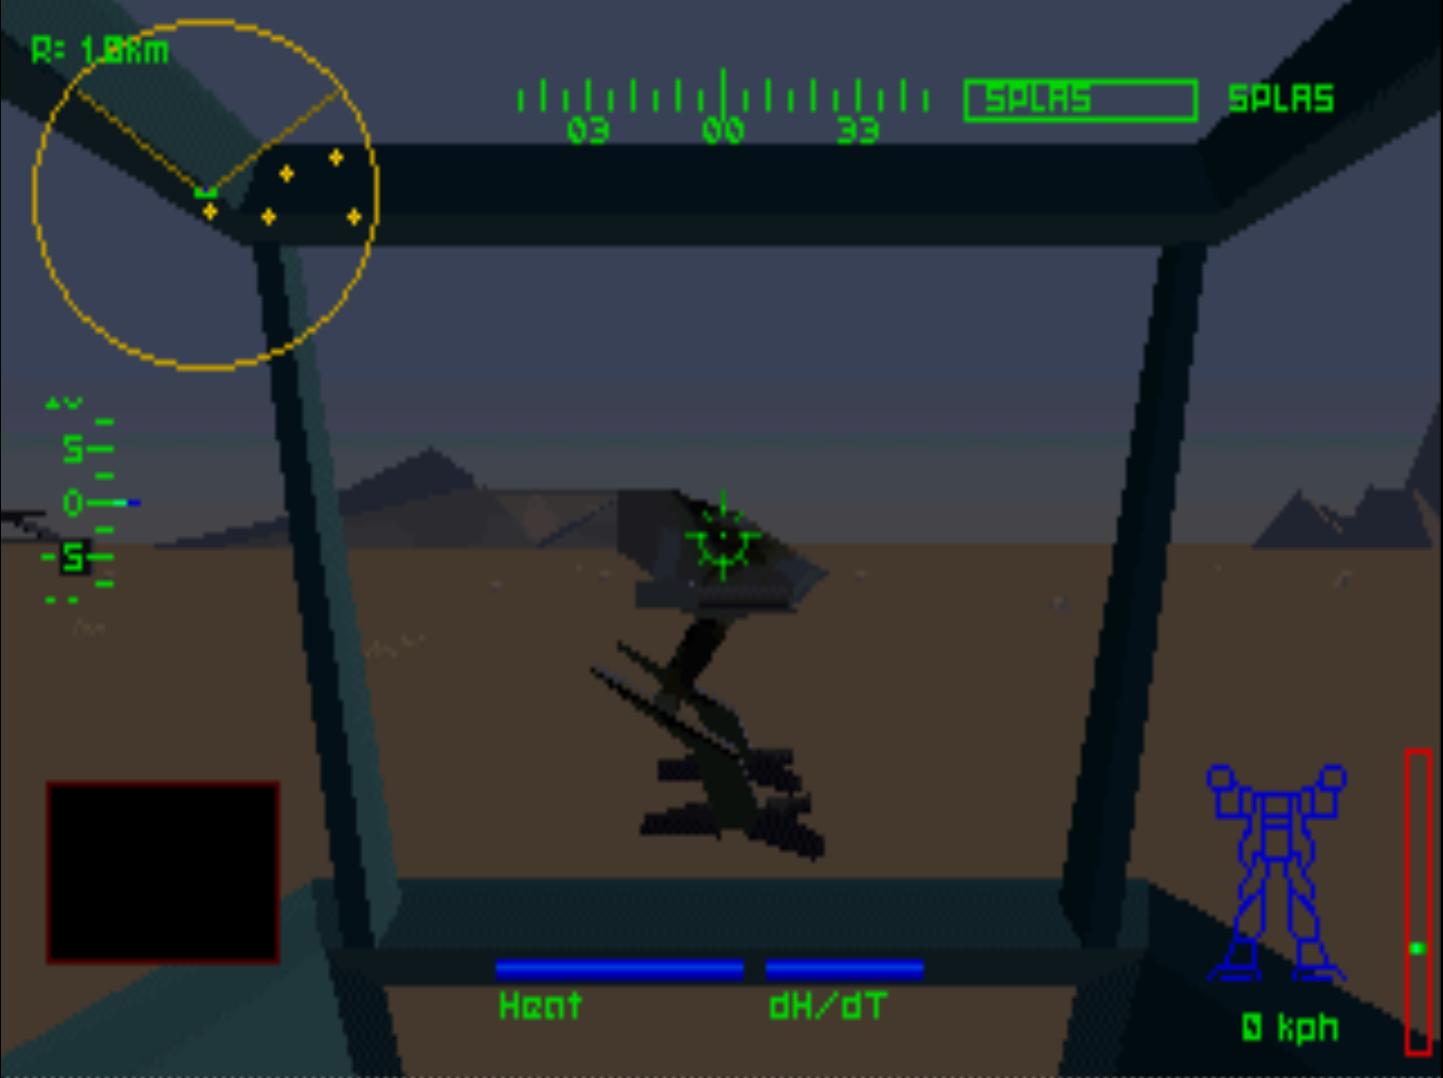 Figure 3 - Mech Warrior 2 with 320x240 resolution